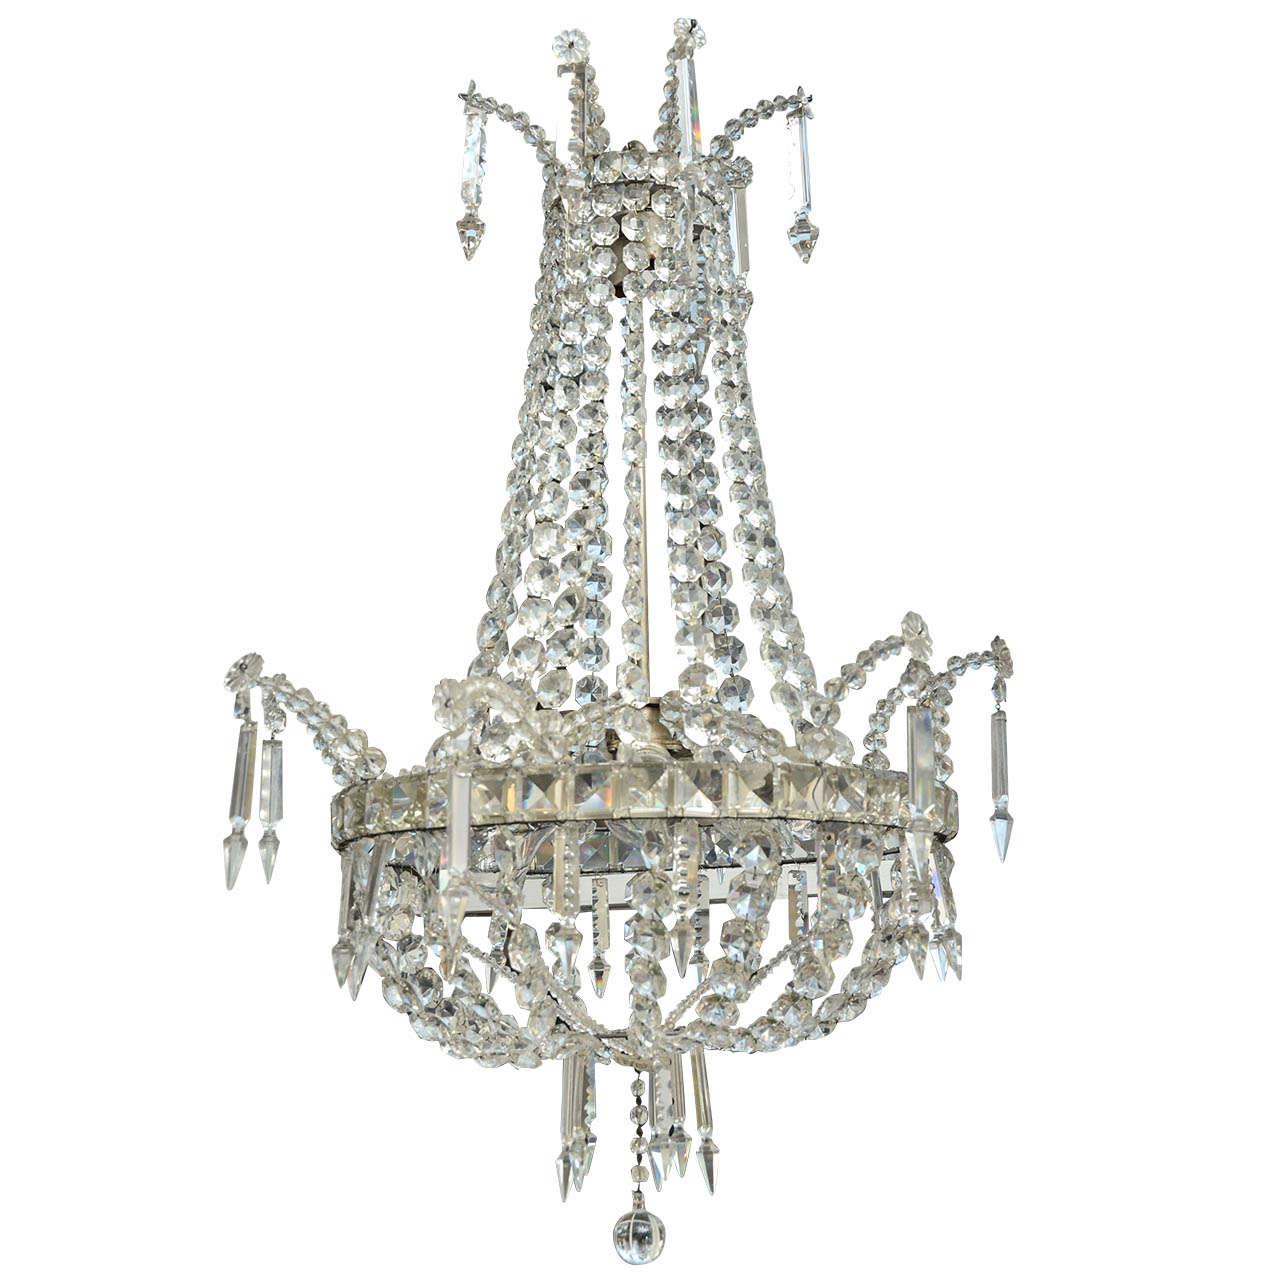 19th century swedish crystal regency style chandelier at 1stdibs 19th century swedish crystal regency style chandelier 1 arubaitofo Gallery